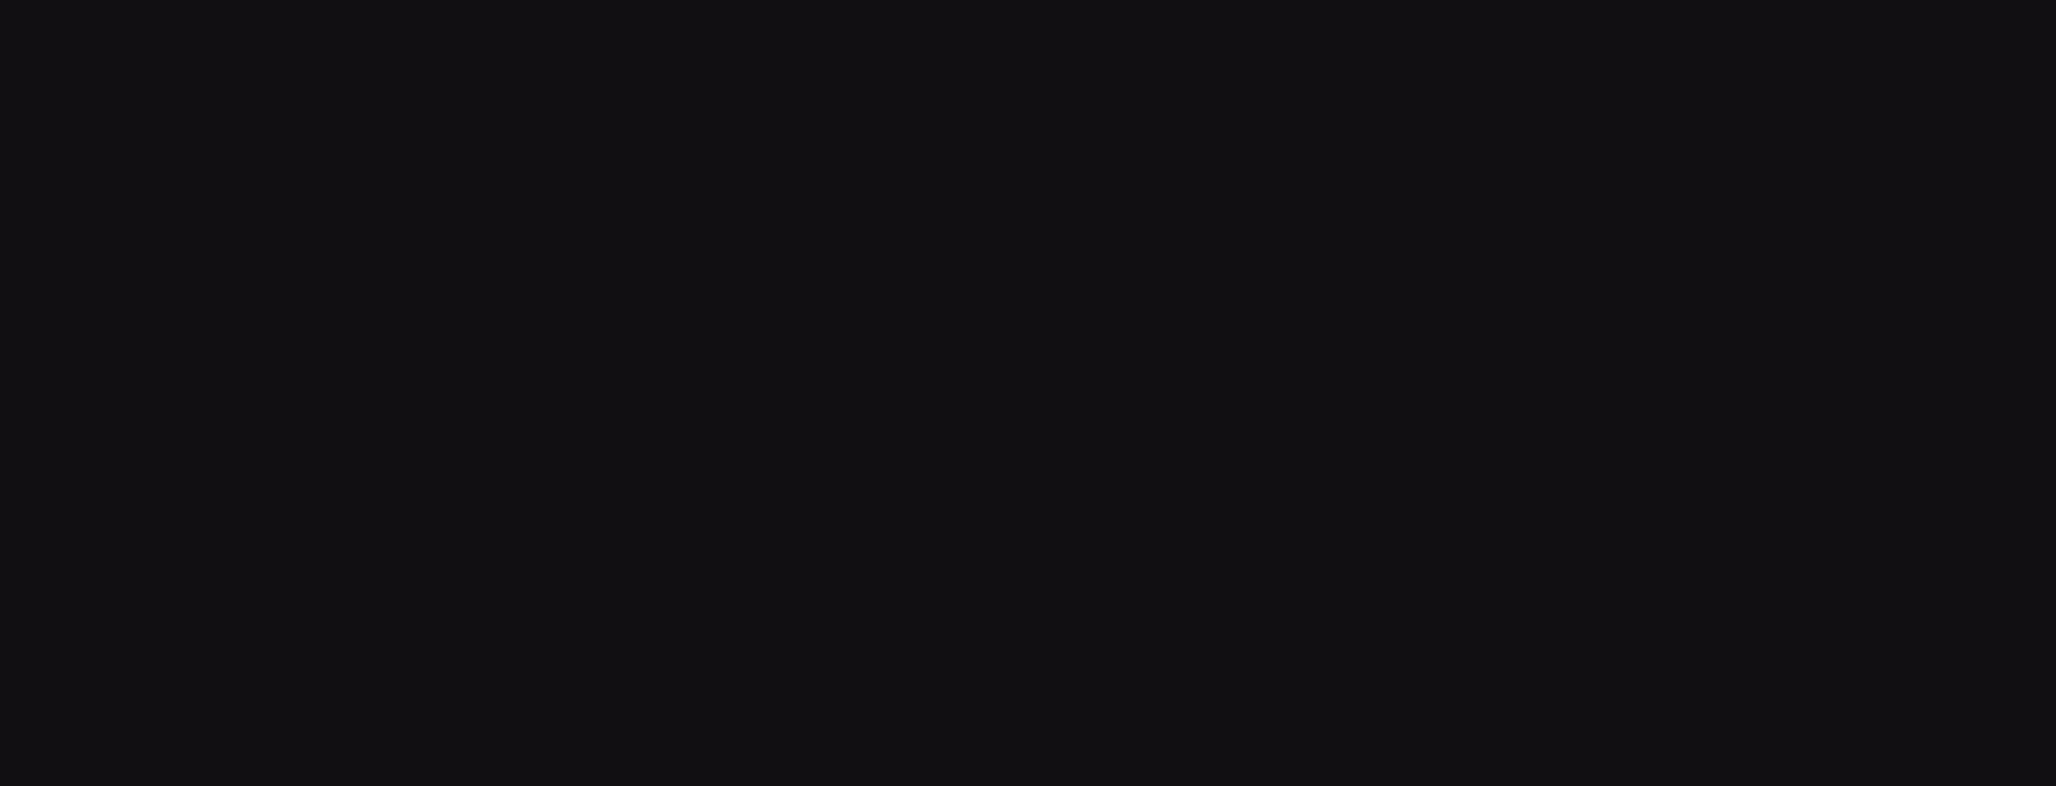 black.friday.2019.BG